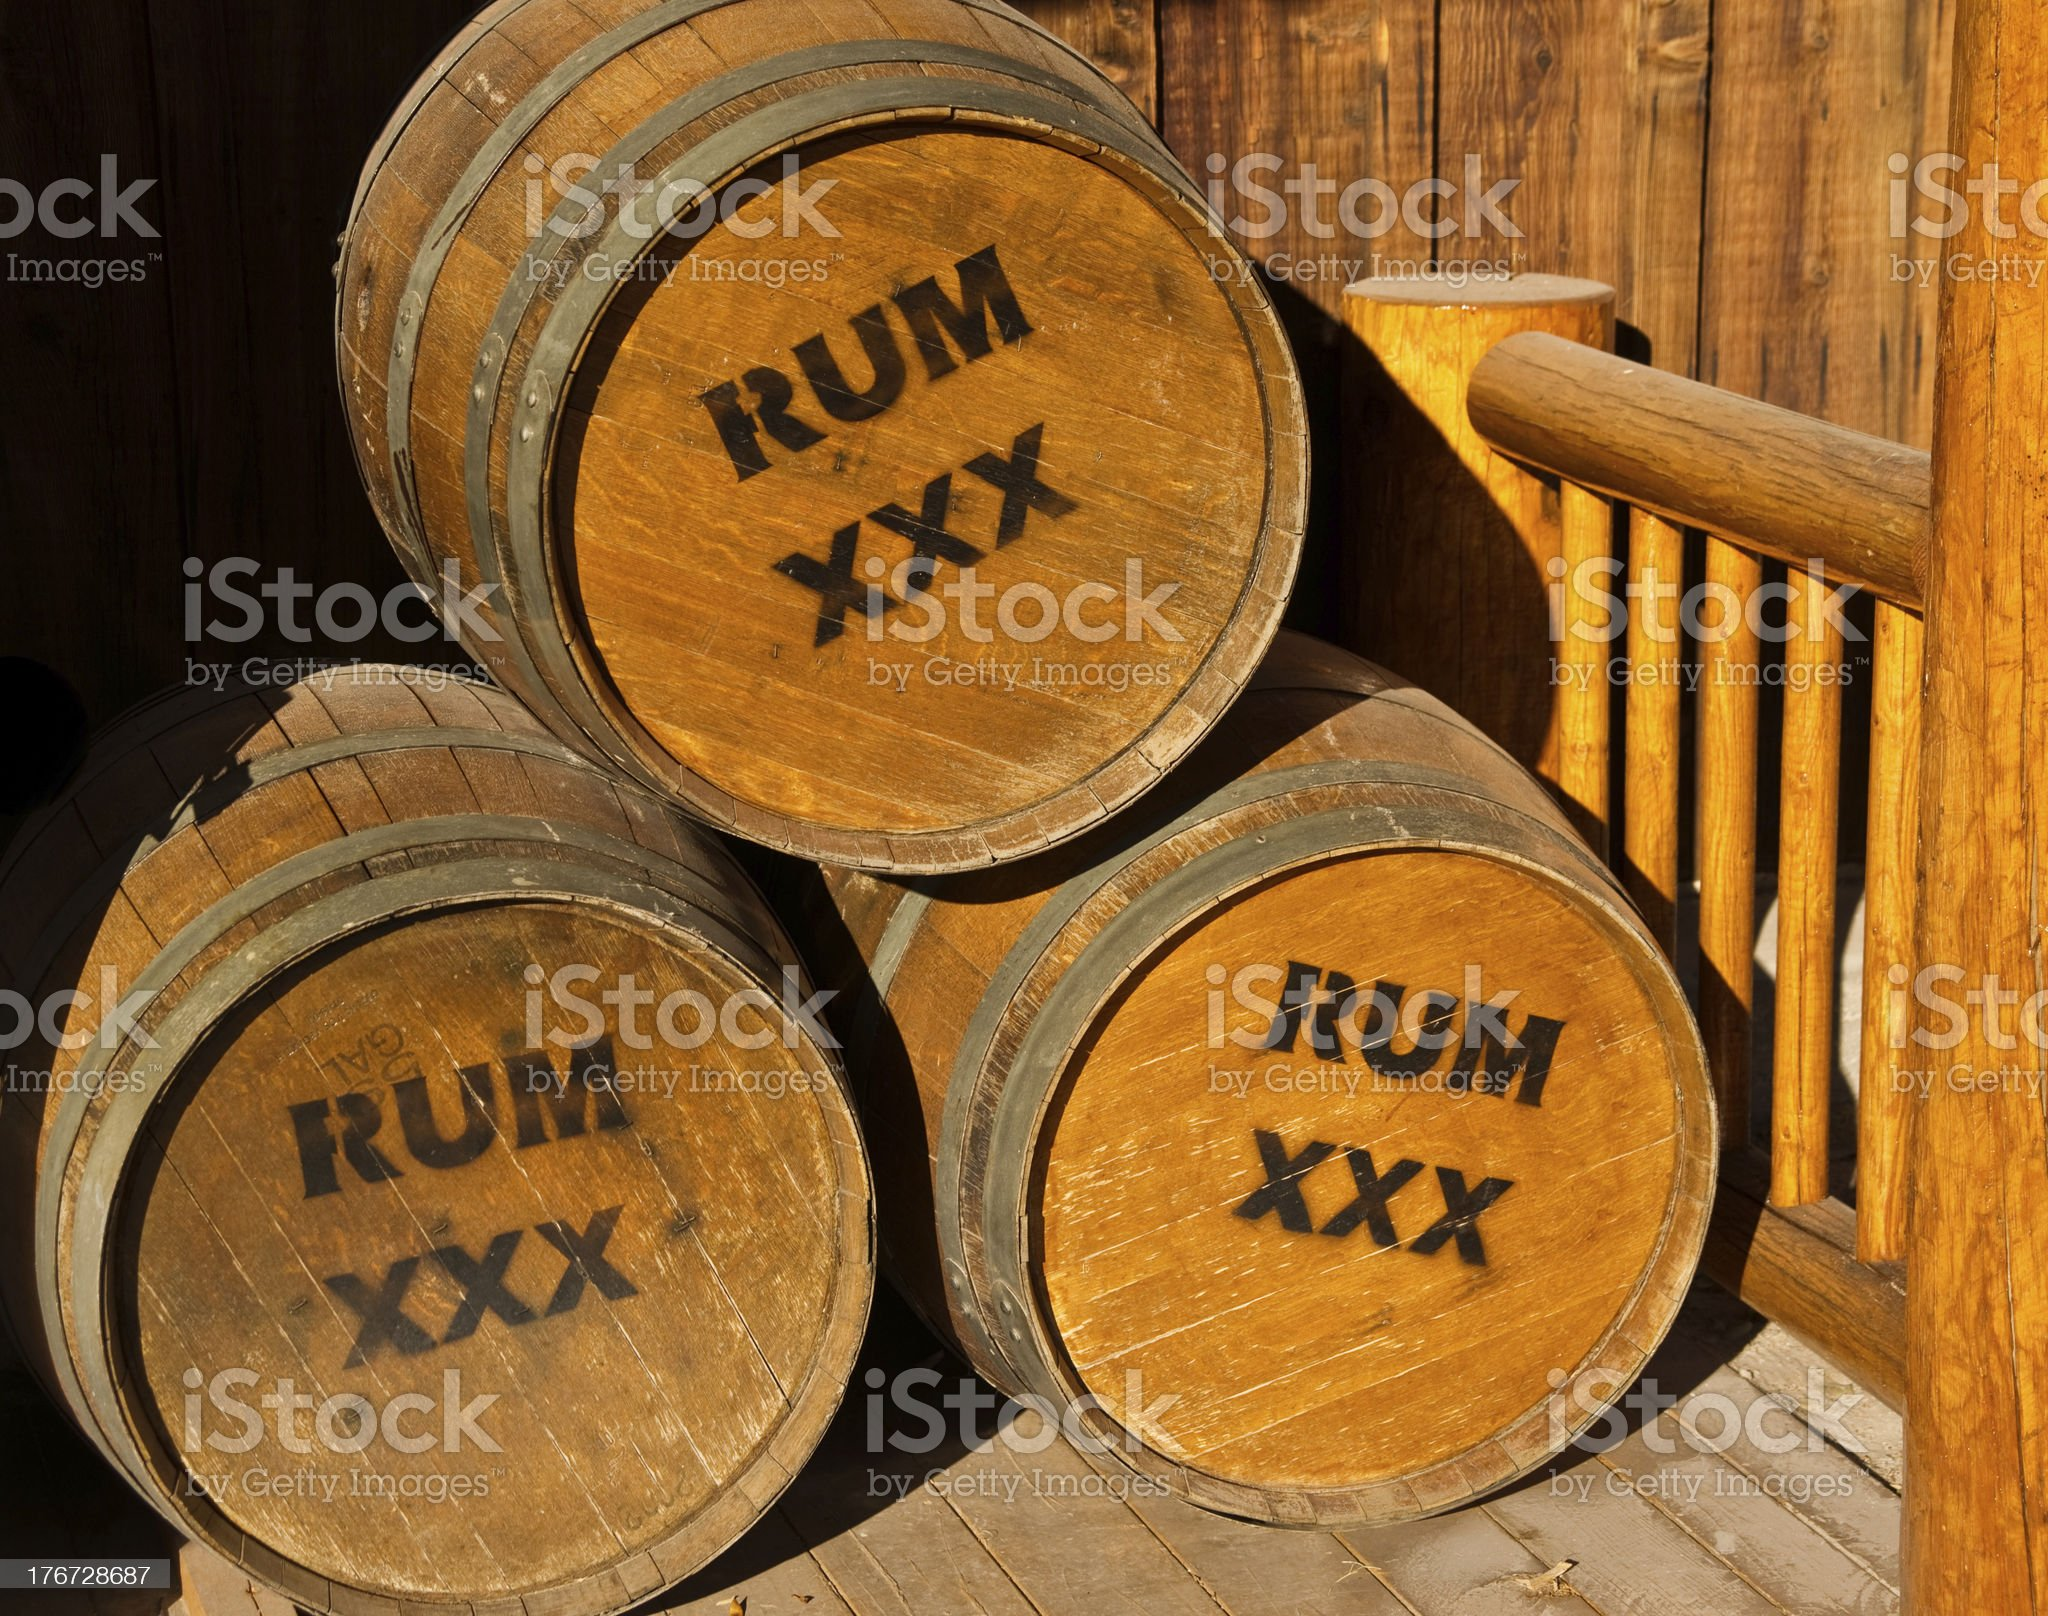 Barrels of Rum royalty-free stock photo